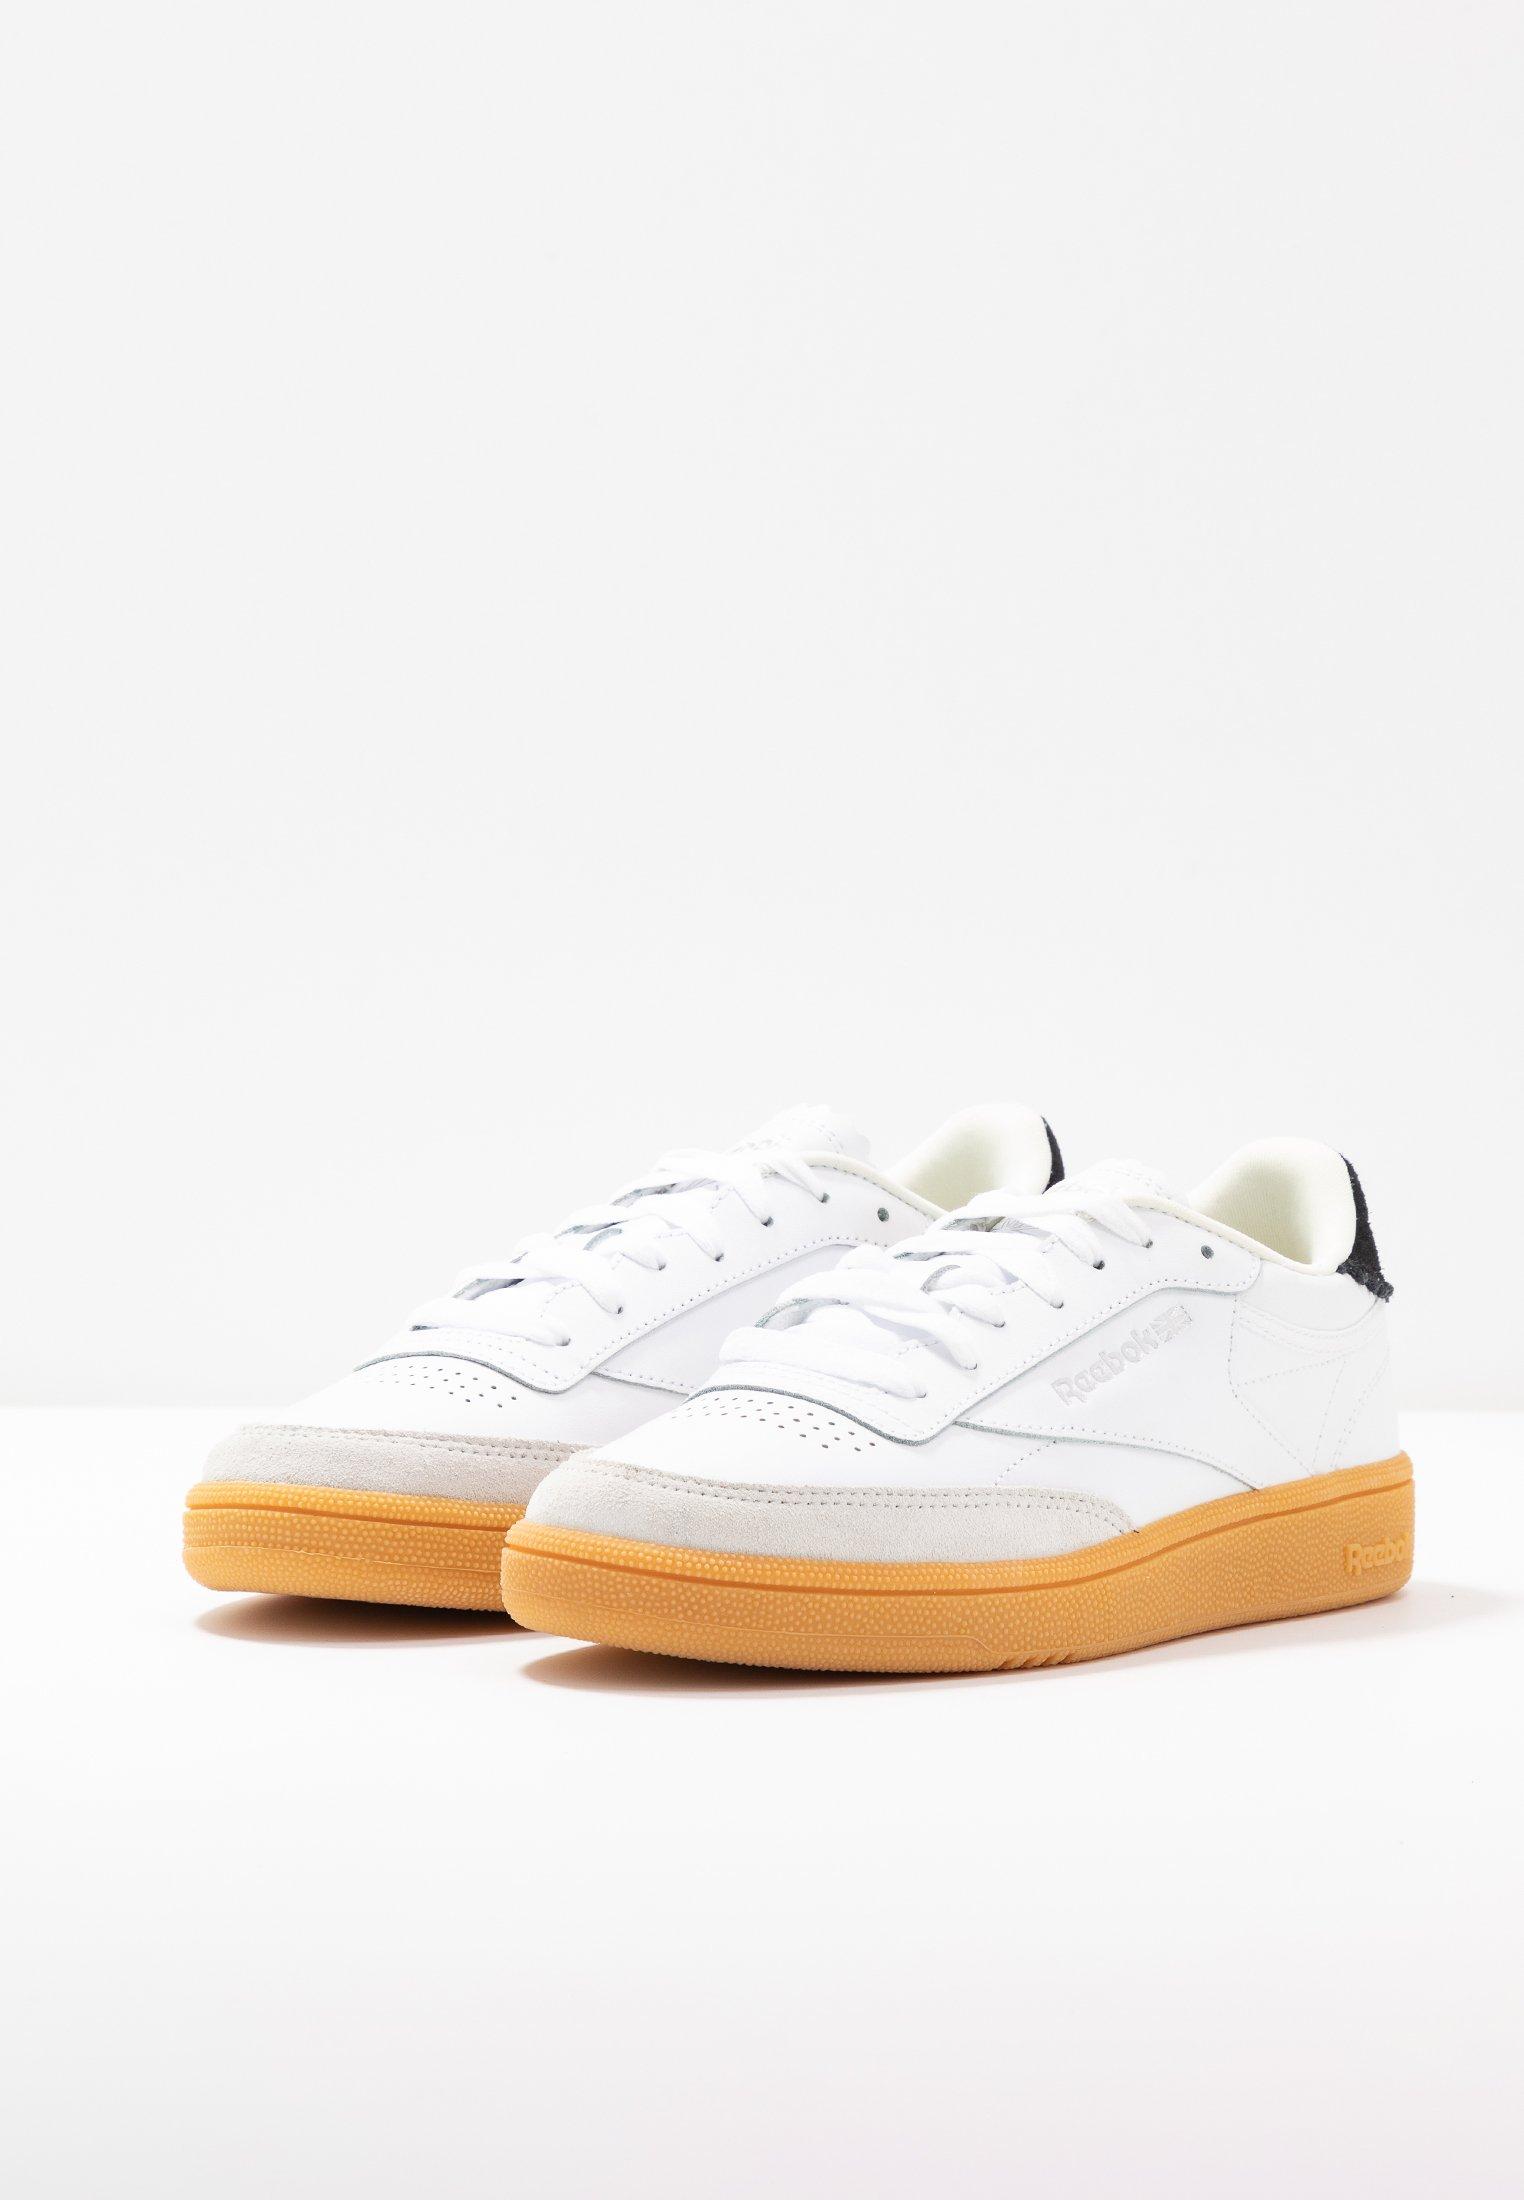 Reebok Classic CLUB C 85 LIGHT LEATHER UPPER SHOES Sneaker